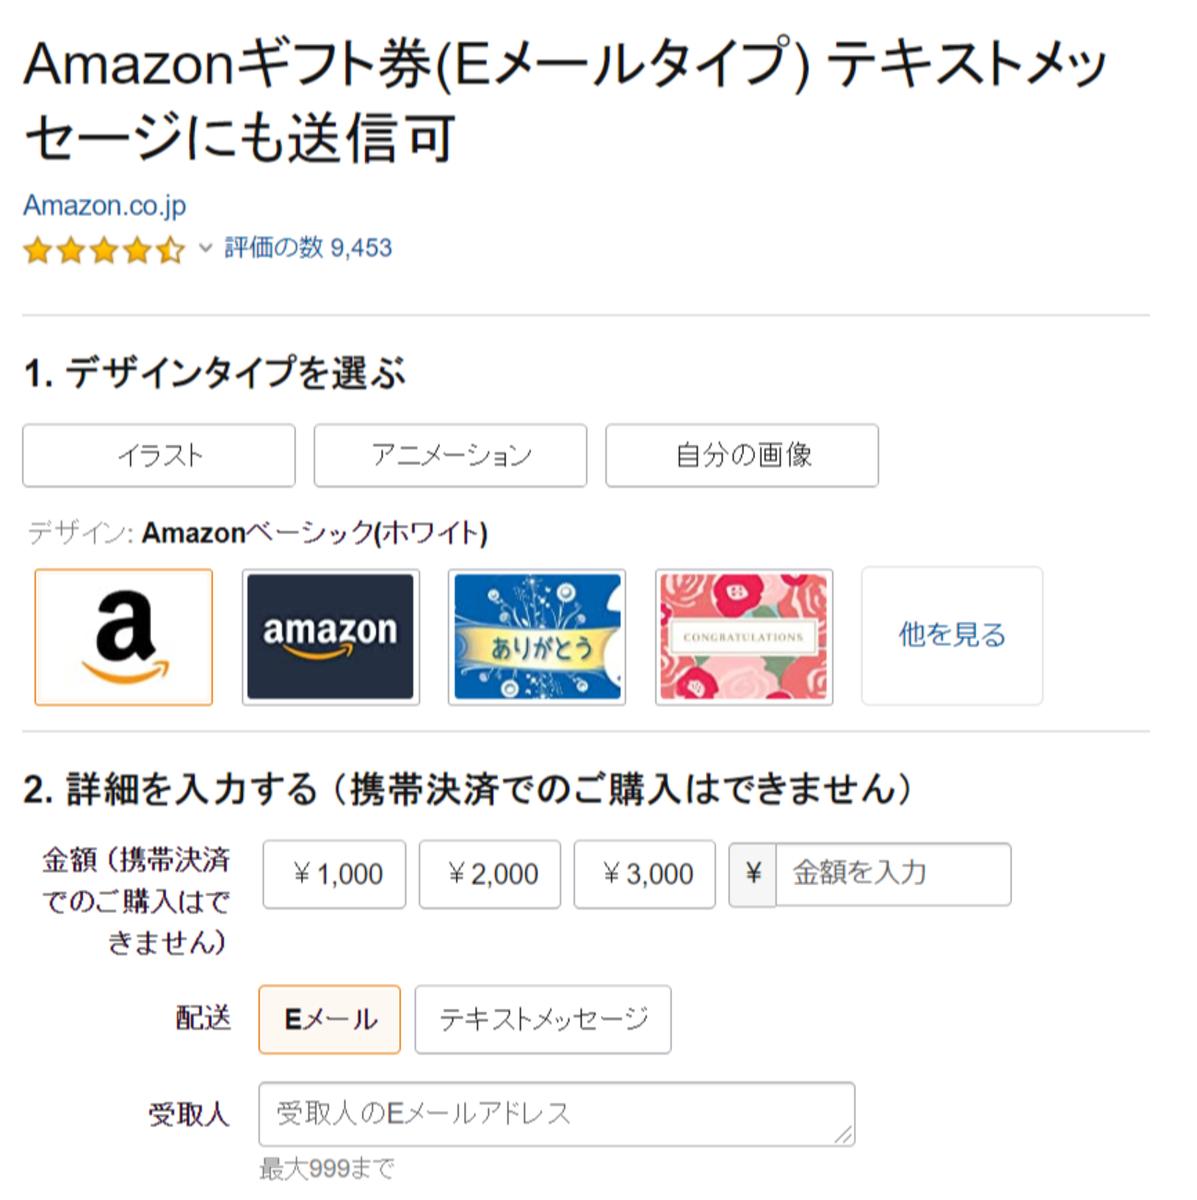 Amazon ギフト 券 送る